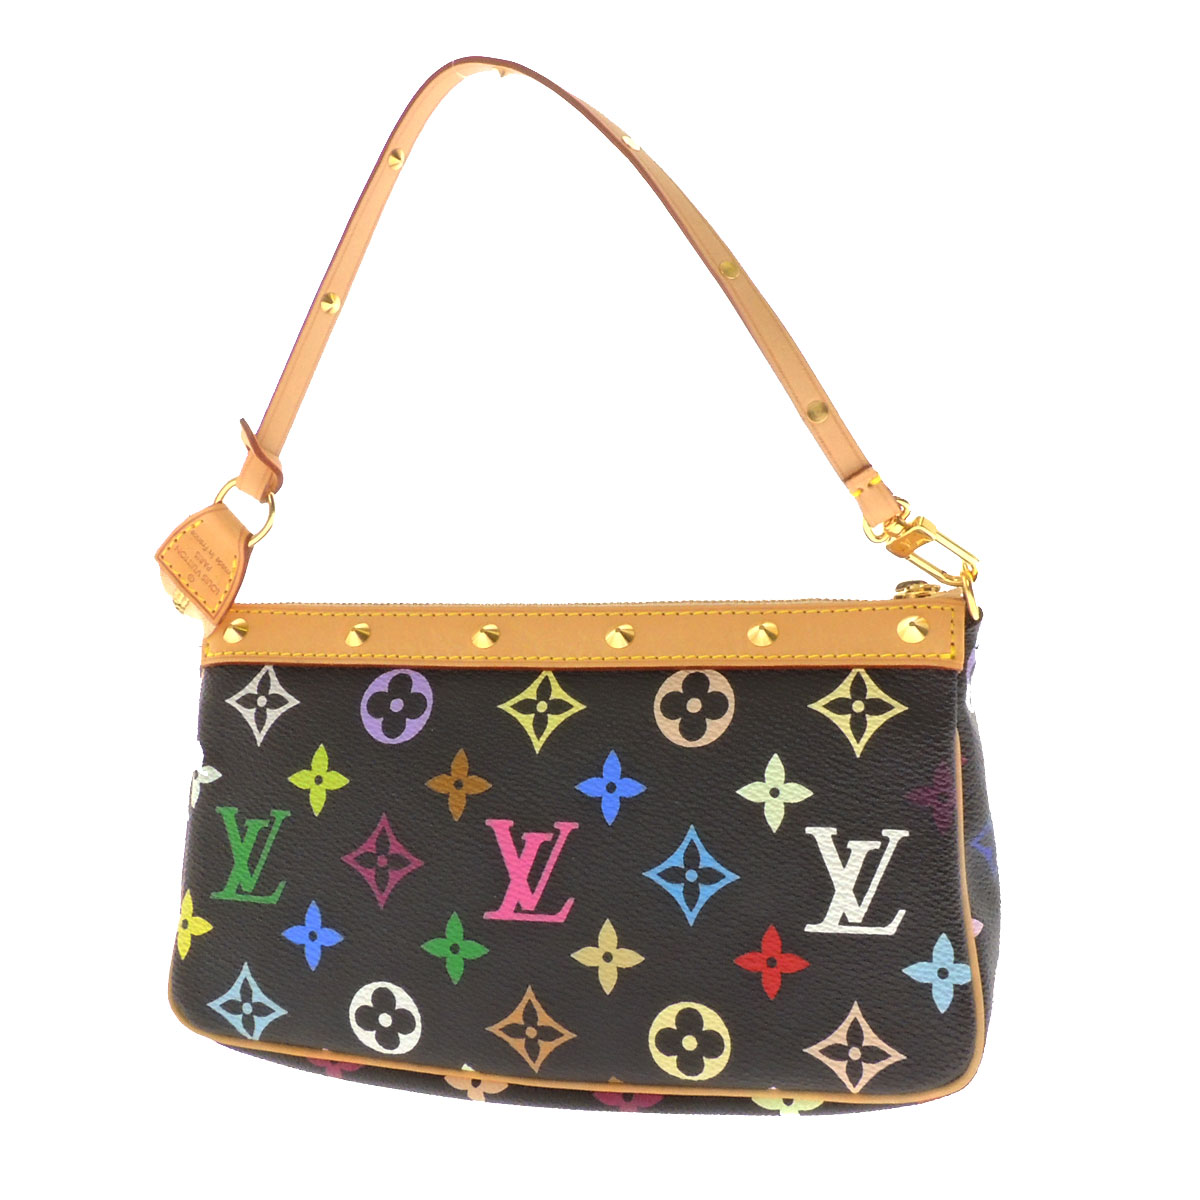 LOUIS VUITTON ポシェットアクセソワール M92648 accessories porch monogram multicolored canvas Lady's fs3gm